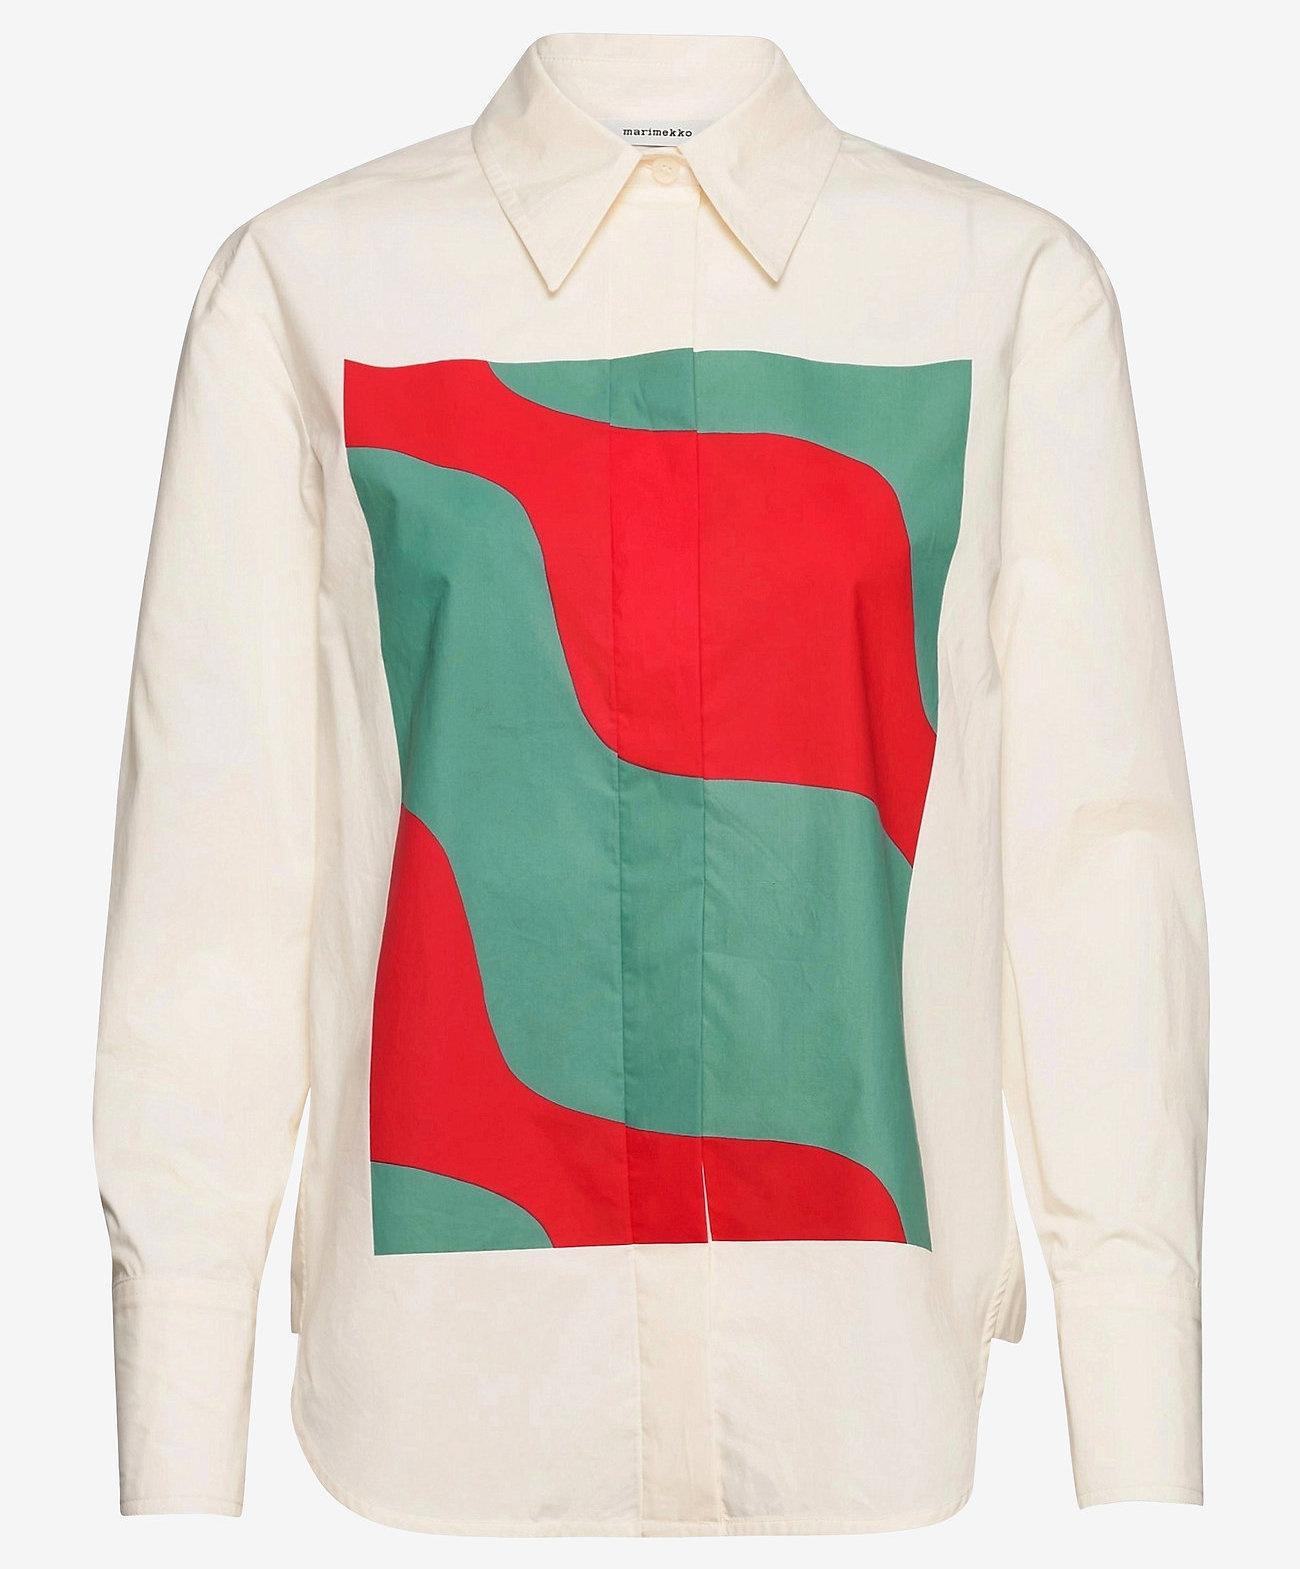 Marimekko Dames blouse, multi